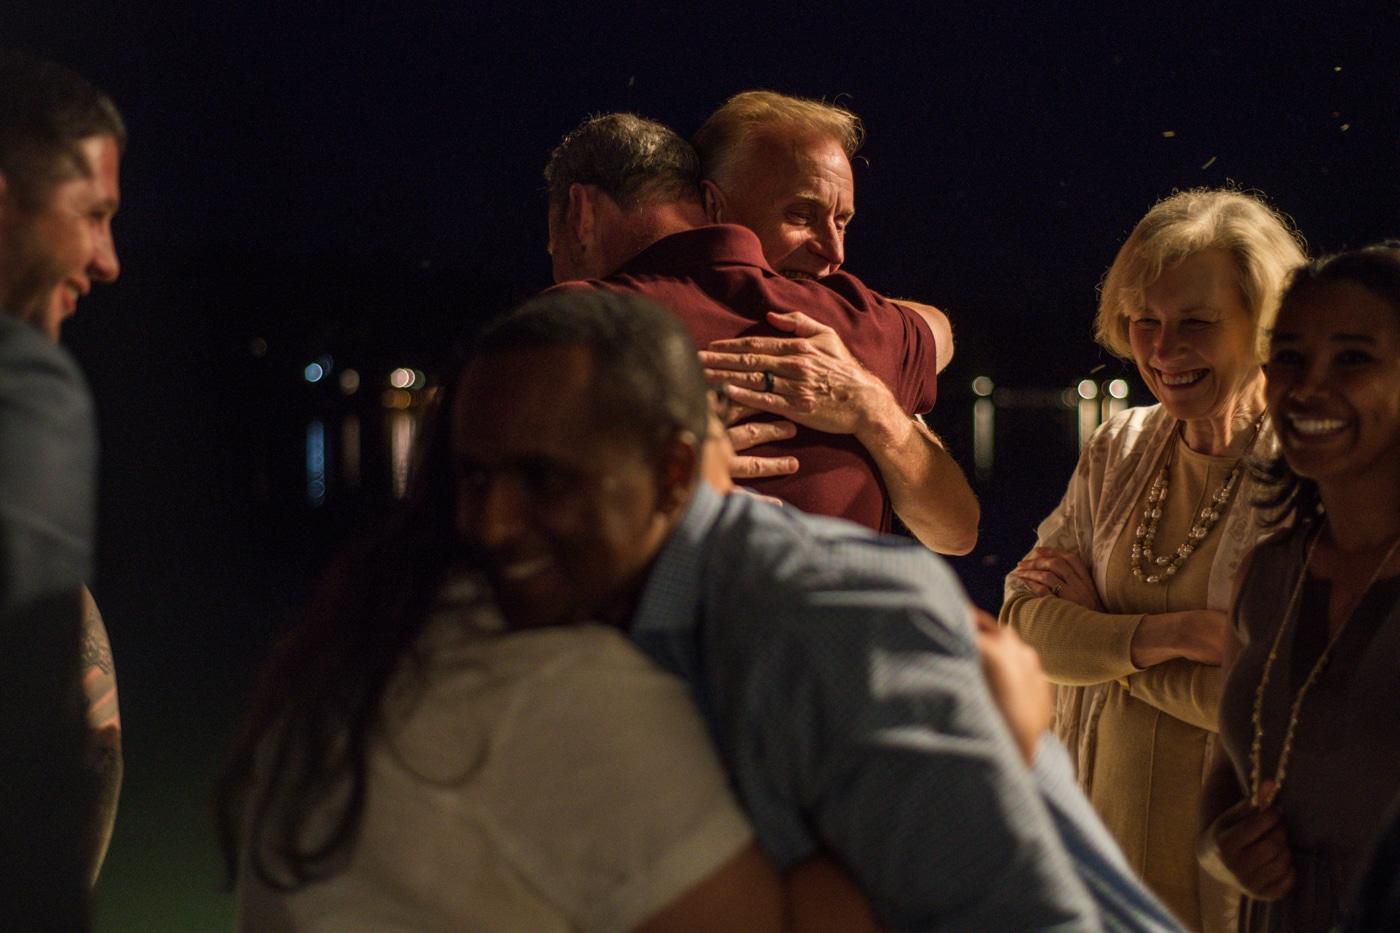 couple hugs during memorial lantern release